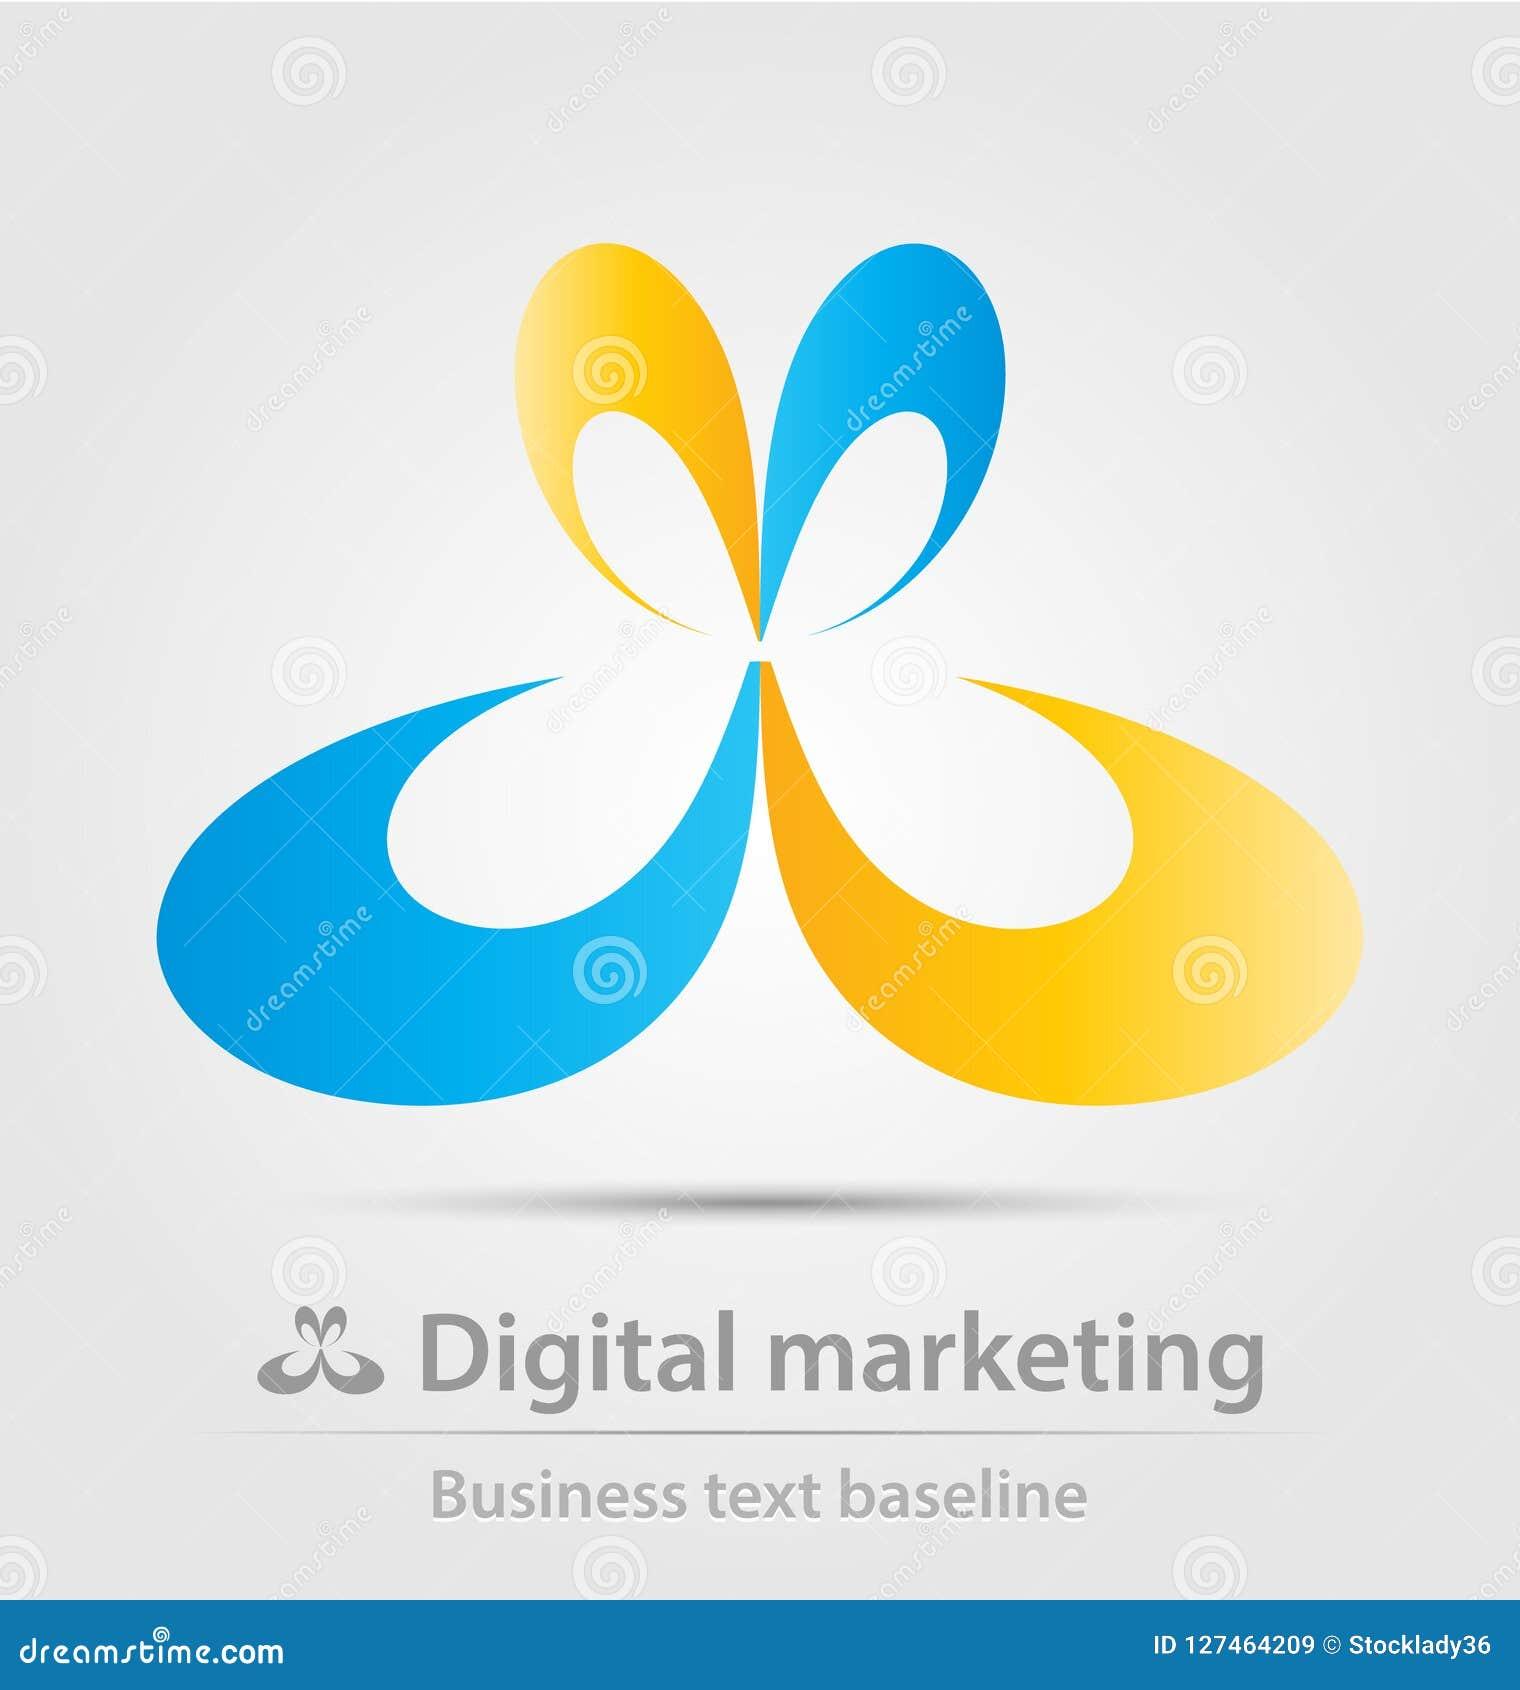 digital marketing business vector logo icon stock vector illustration of geometric logoicon 127464209 https www dreamstime com digital marketing business icon creative design image127464209